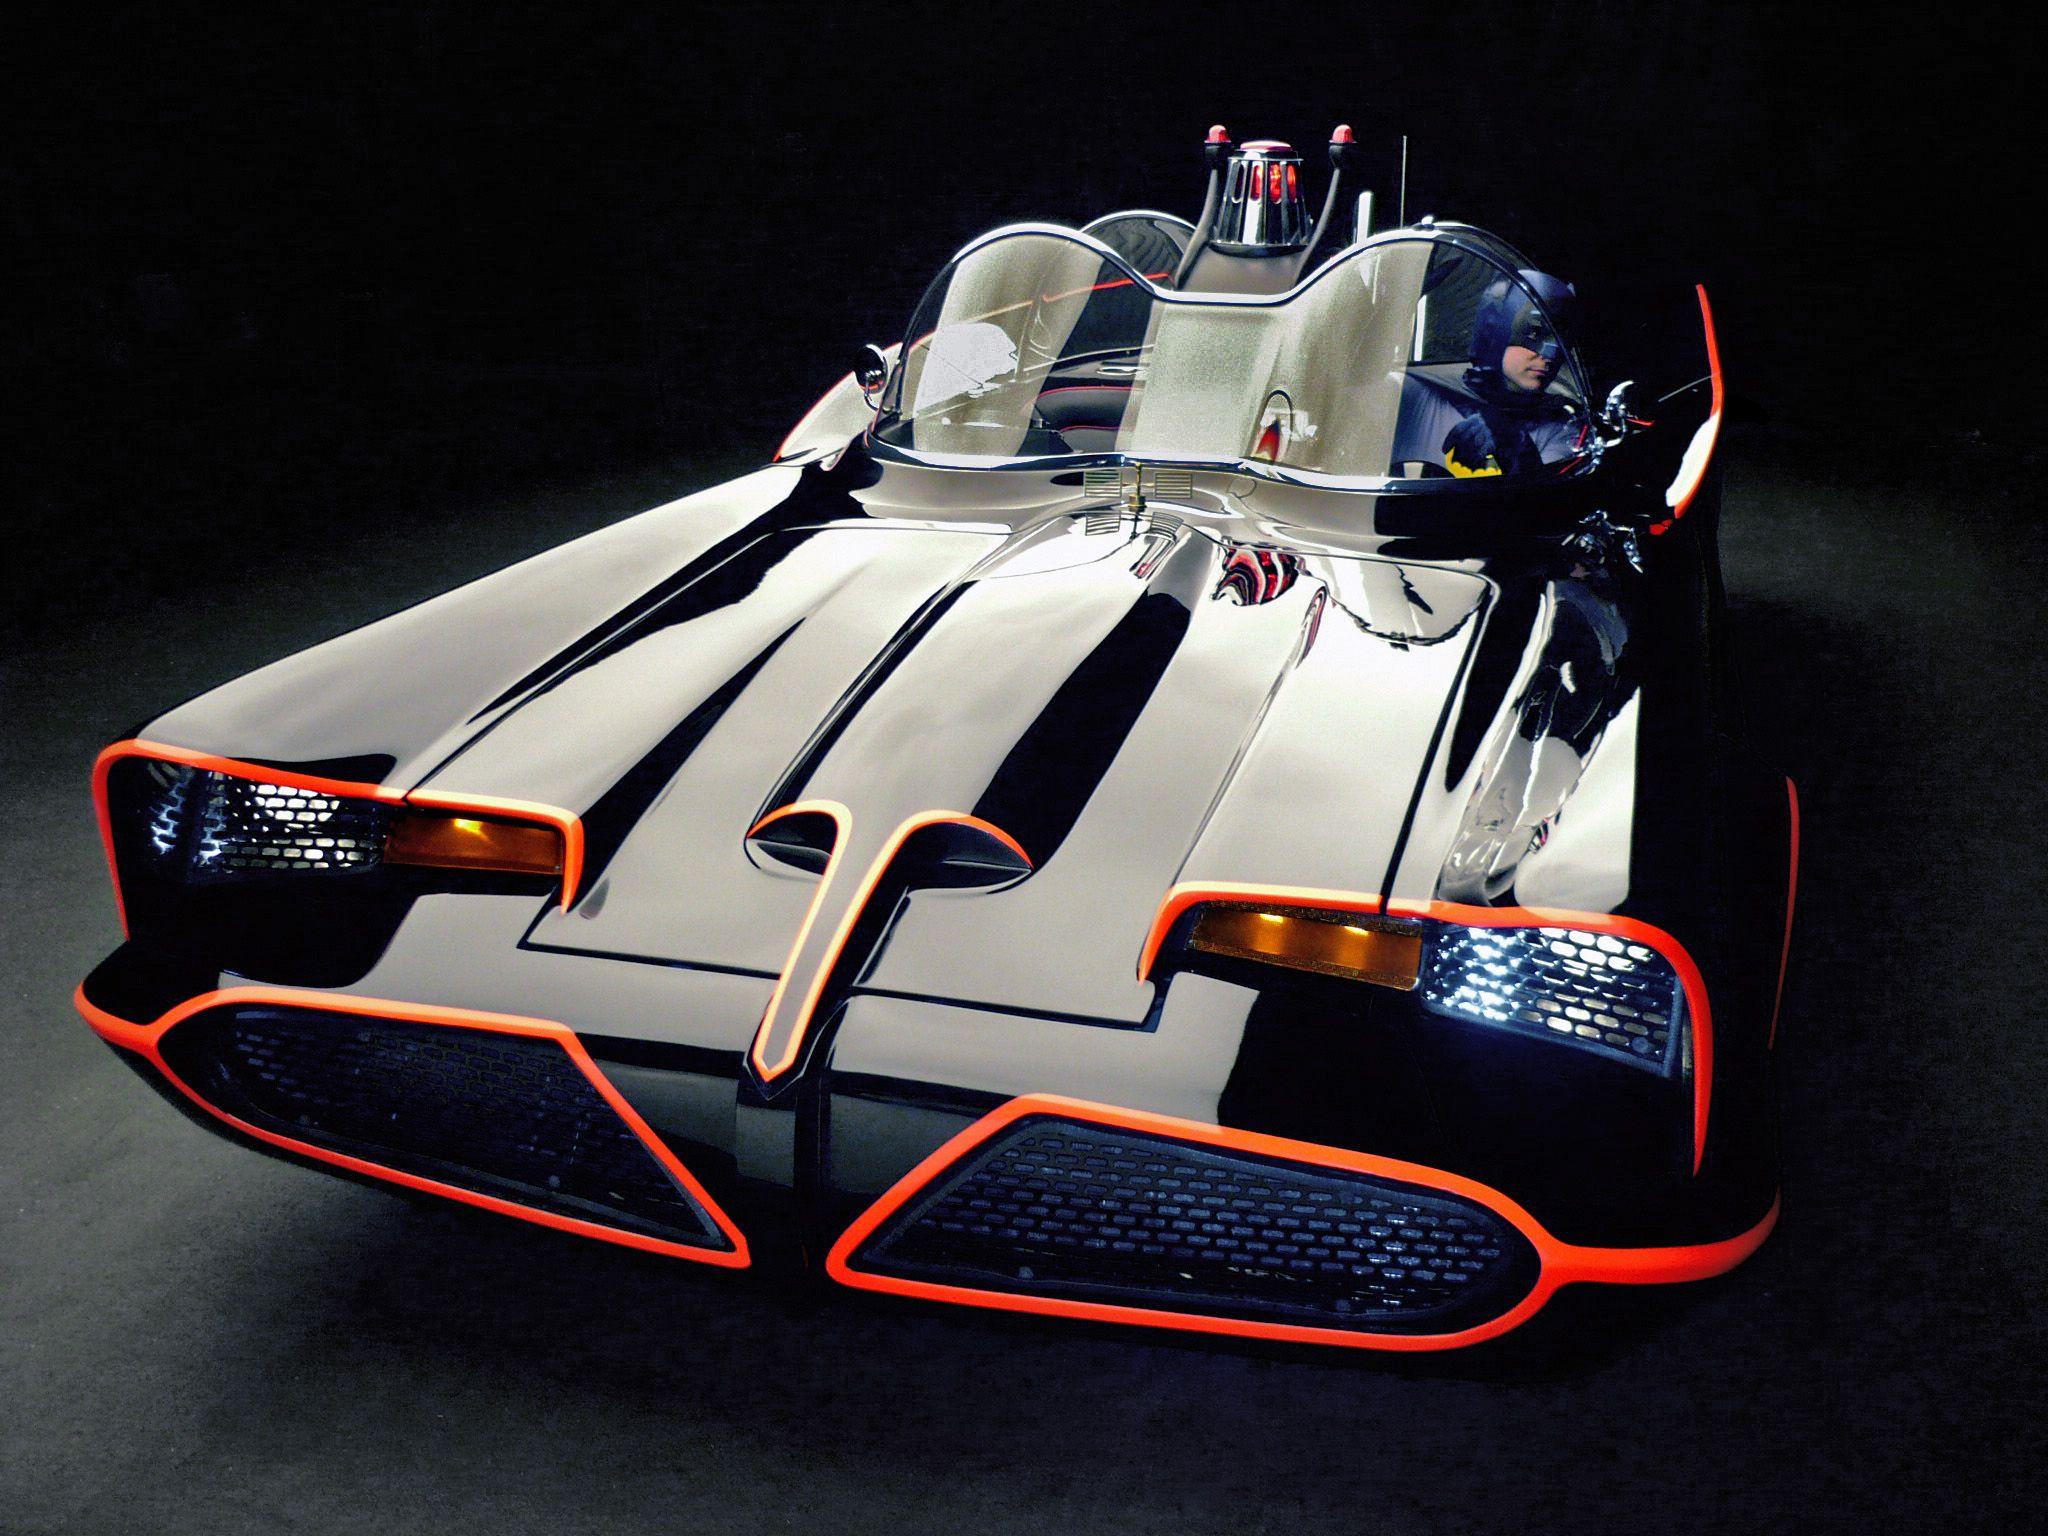 Batmobile Replica CaR STuFF Pinterest Batmobile - Brand new batmobile revealed awesome